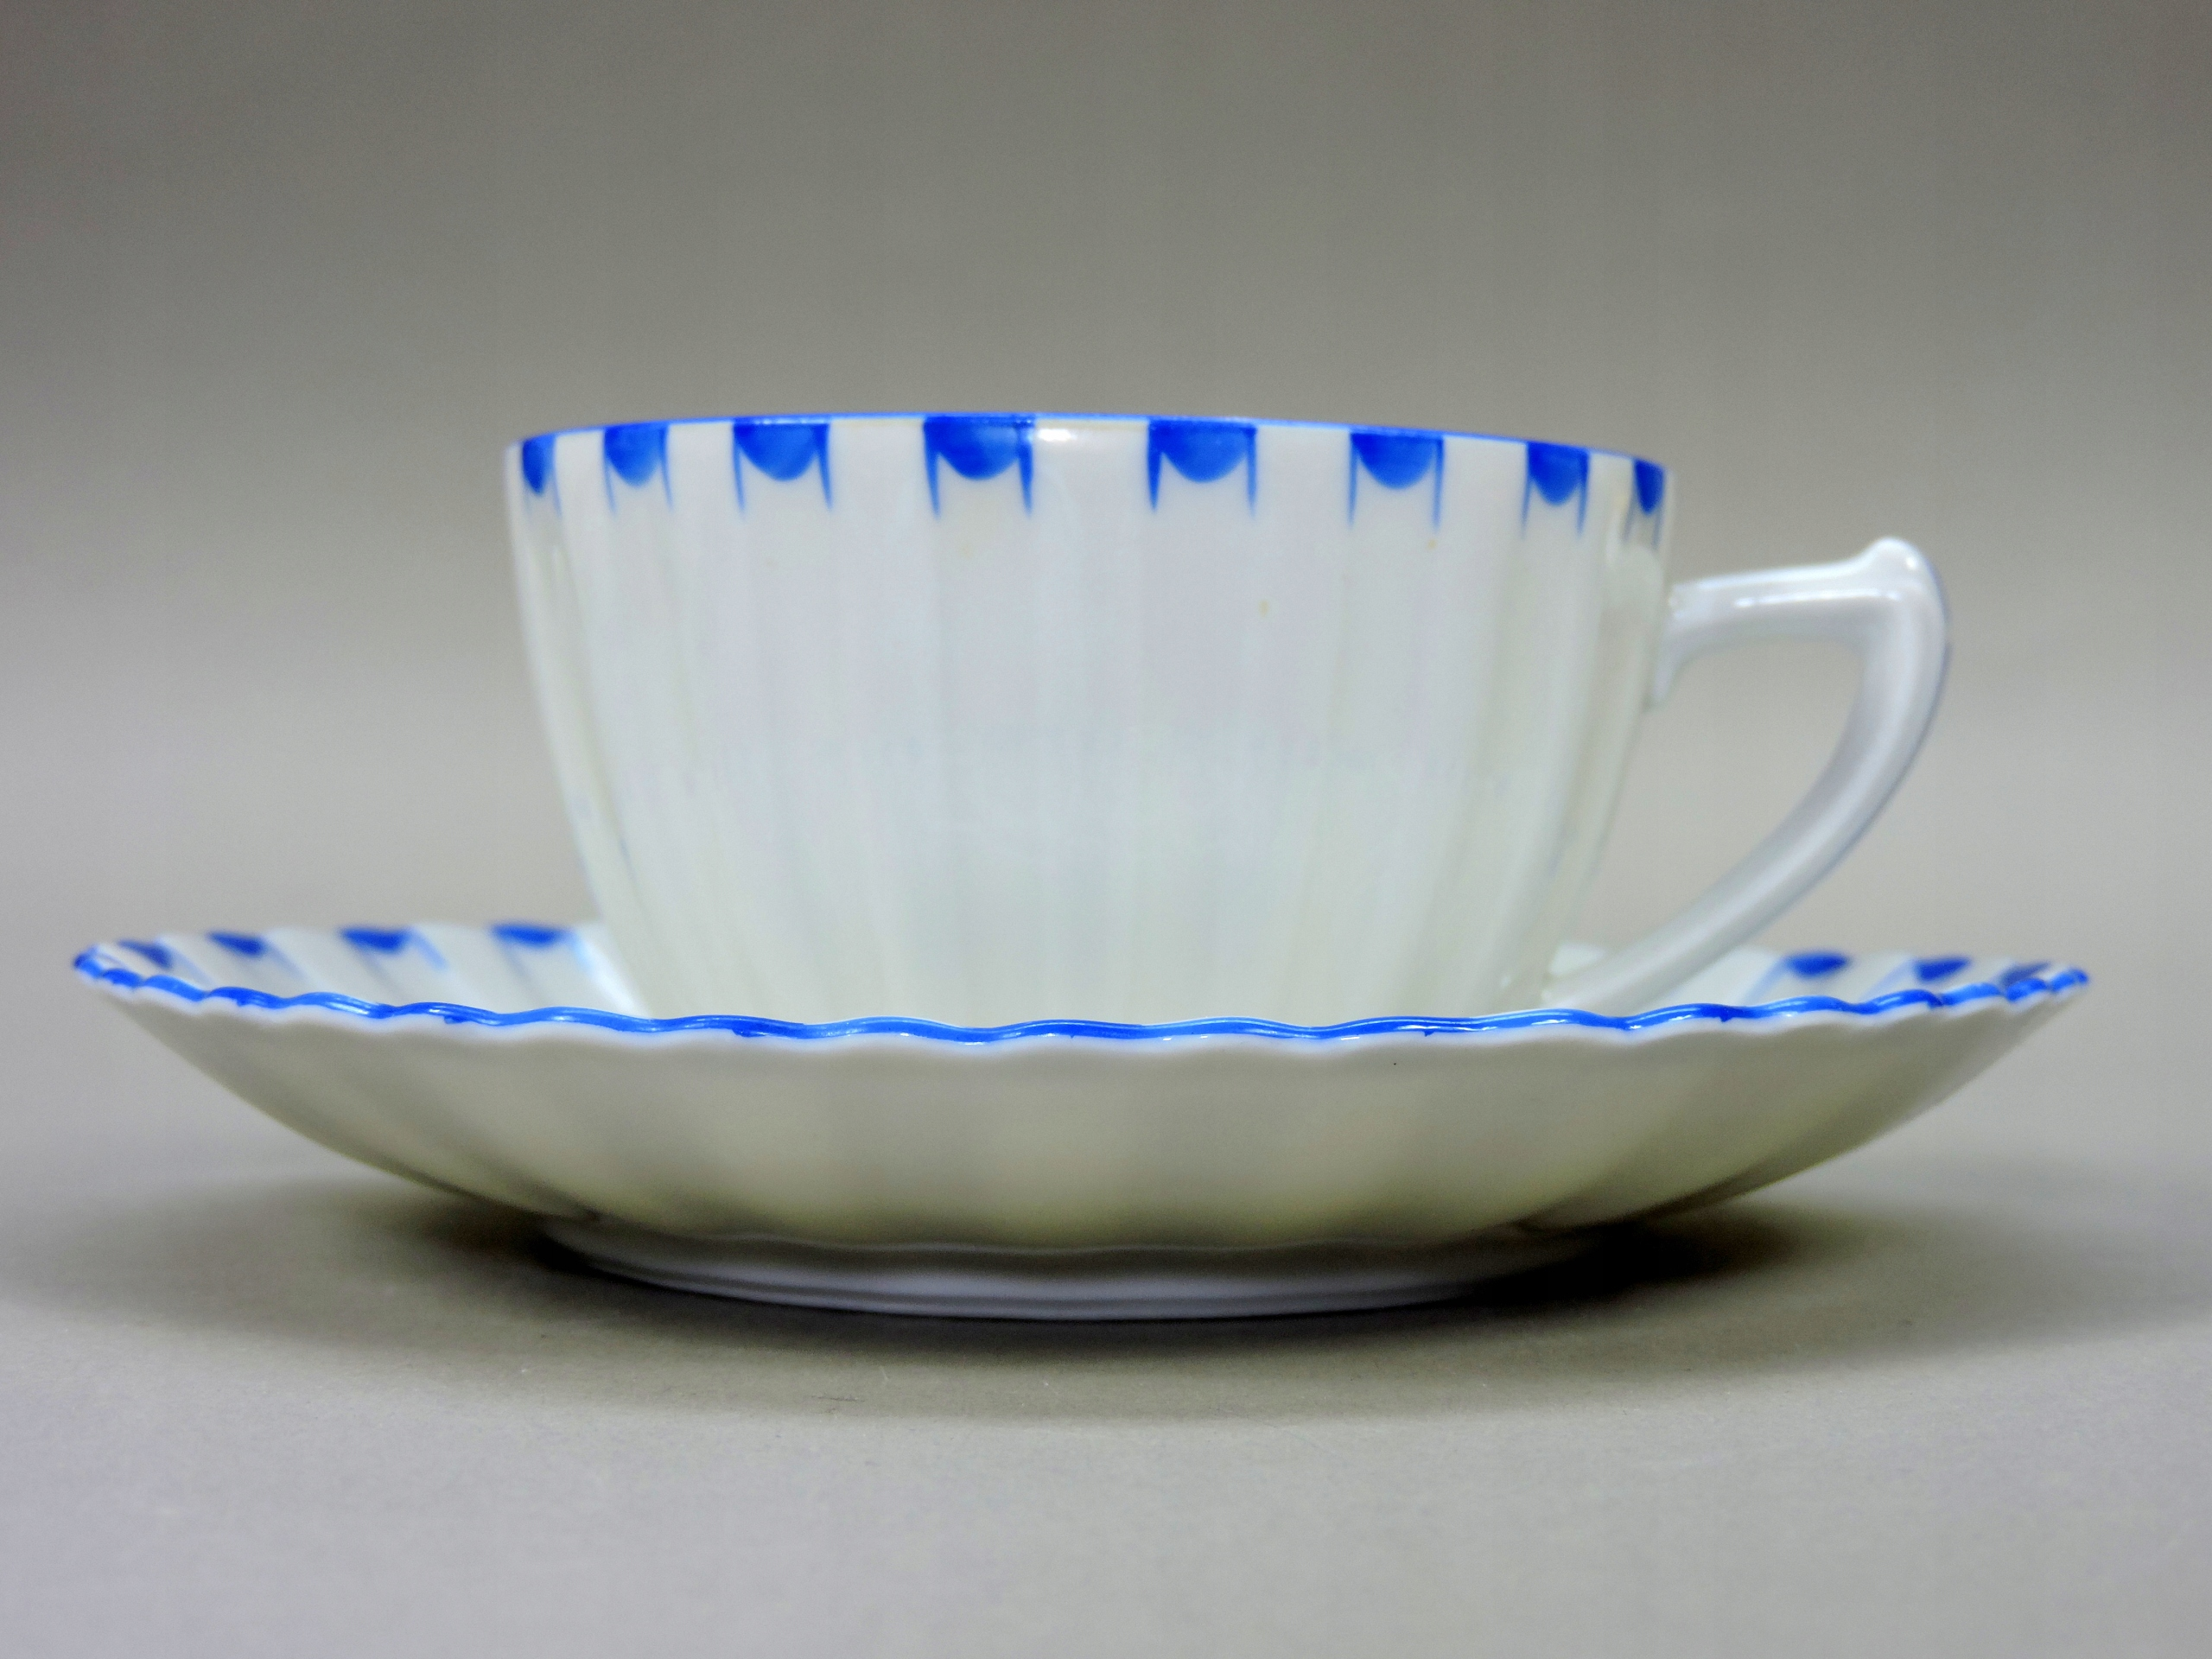 Filiżanka Parowa Tuppack 1930 karbowana niebieska